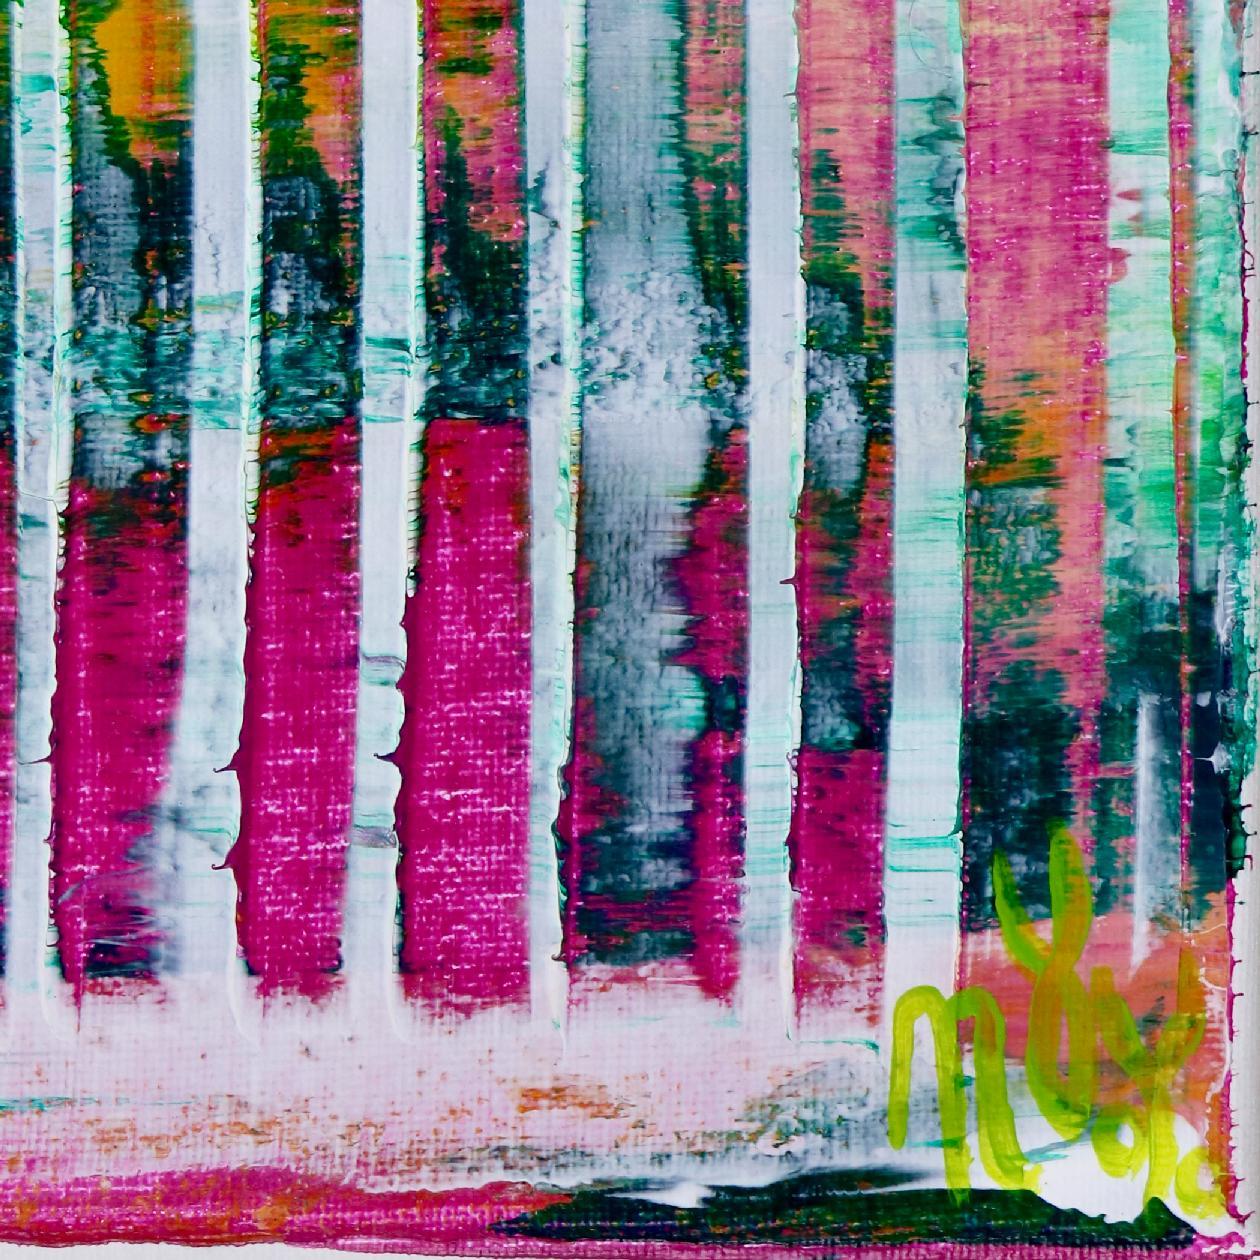 Signature - Pink Refractions (Green Textures) 1 (2020) by Nestor Toro